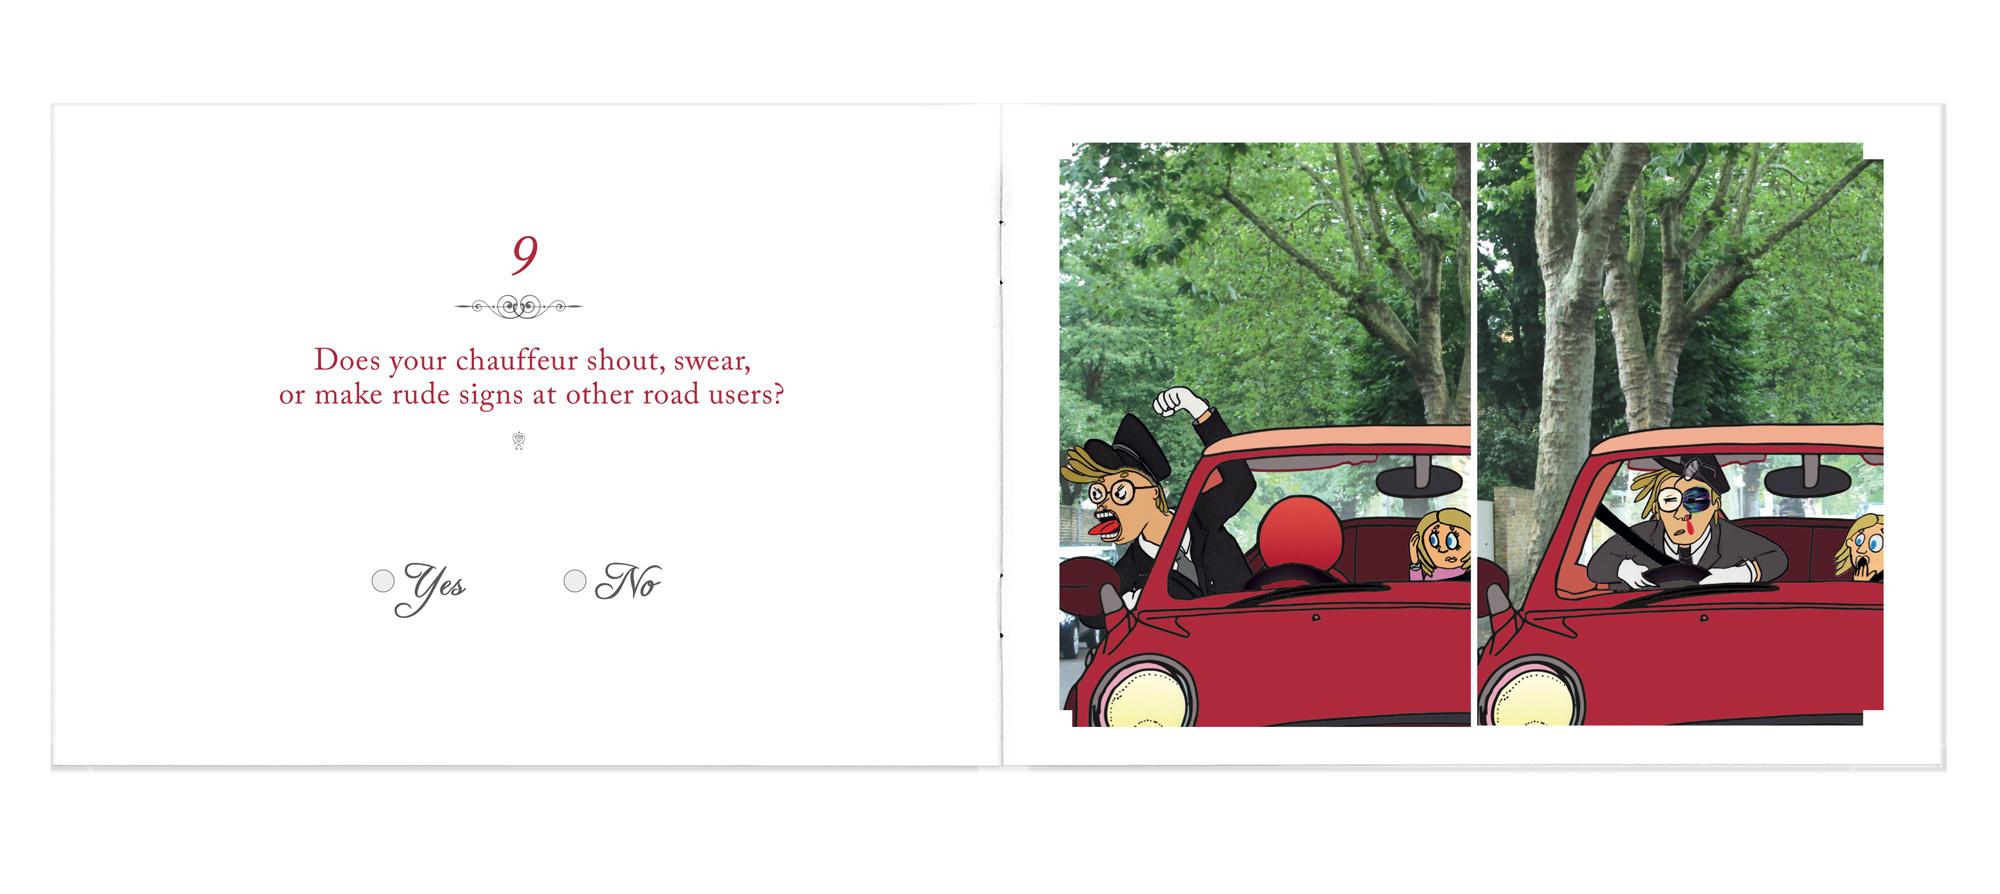 SUSYC_PAGE6-WEB.jpg